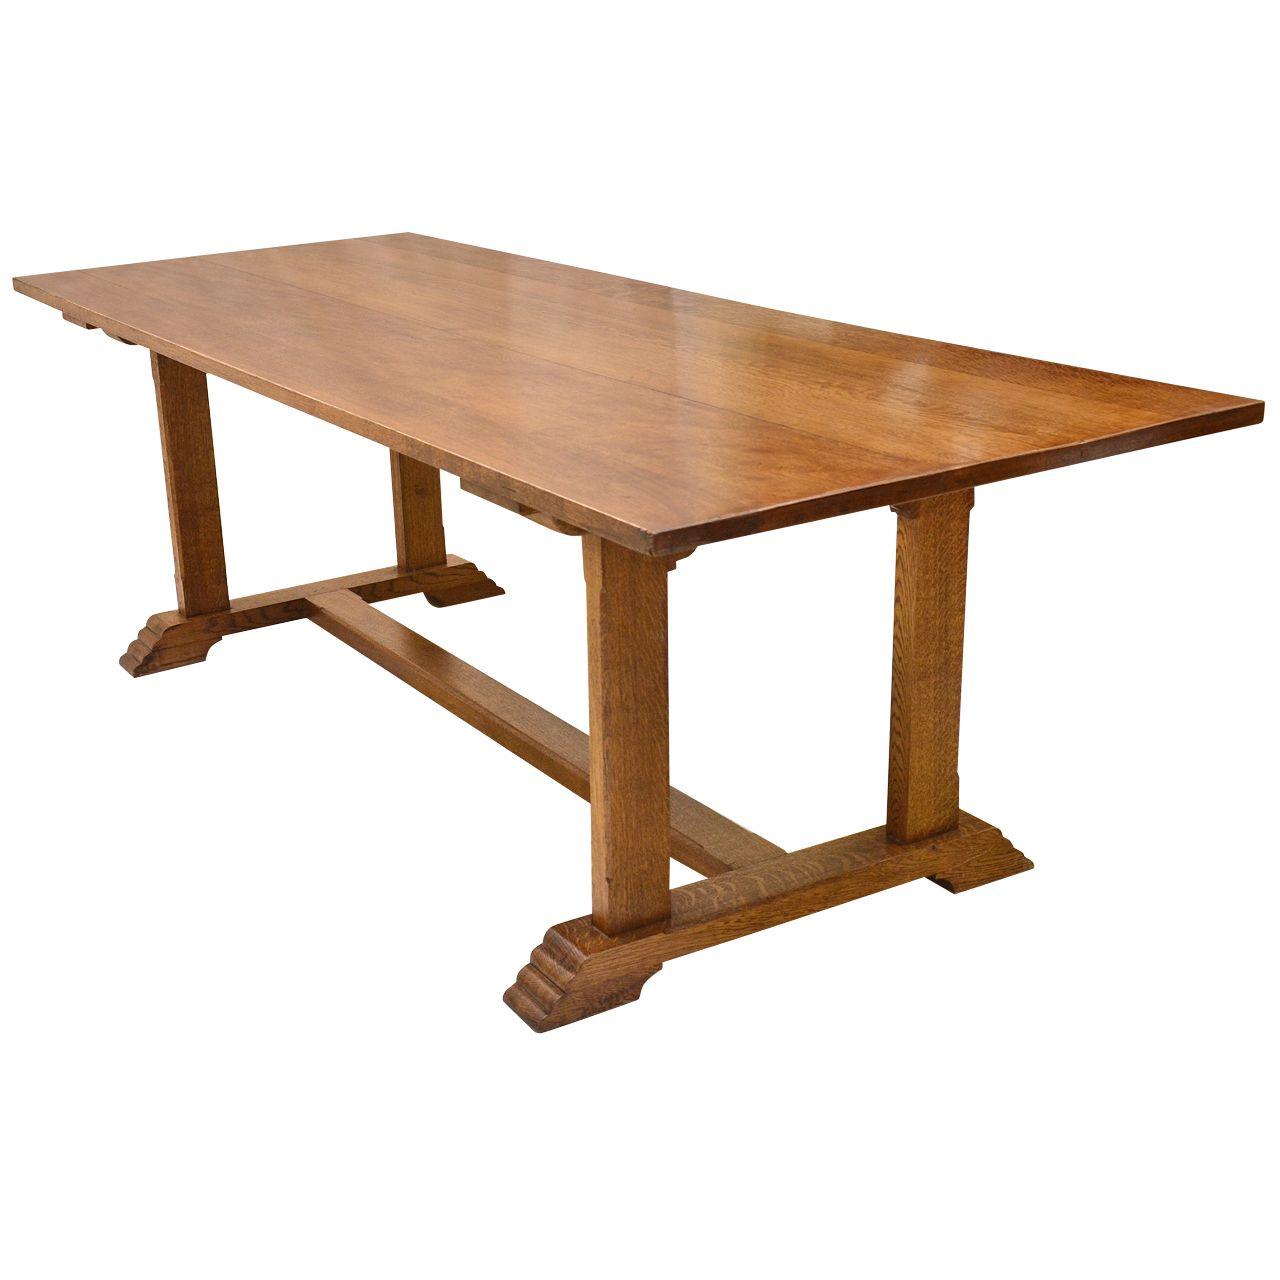 English Oak Trestle Base Gordon Russell Table | Dining room table ...